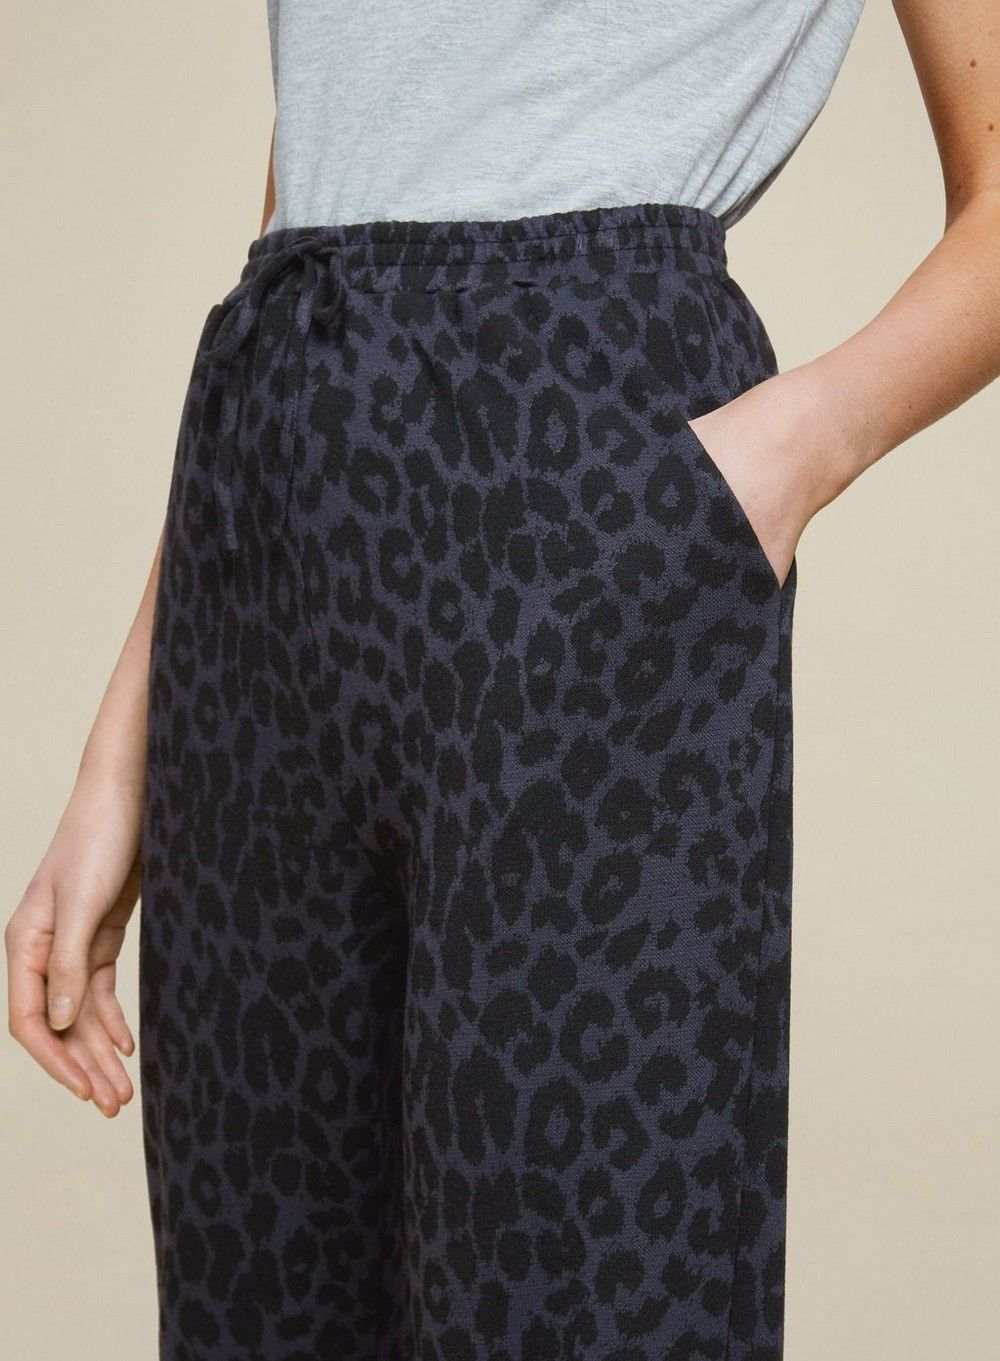 Dorothy Perkins Womens Black Animal Print Cuffed Leg Joggers Activewear Trousers